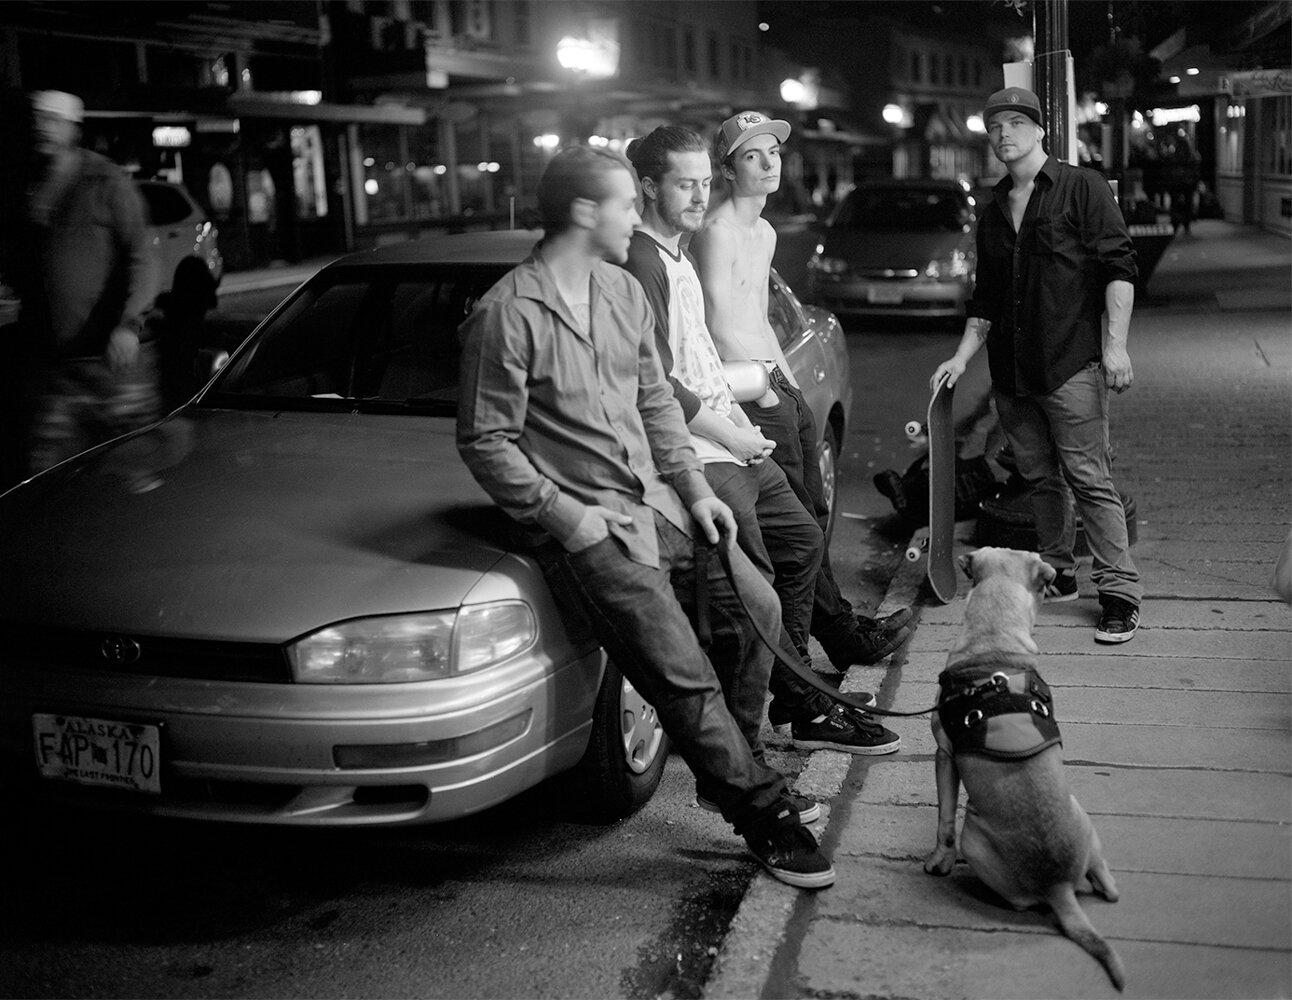 Front Street Guys - Juneau, Alaska 2017  by Patrice Aphrodite Helmar